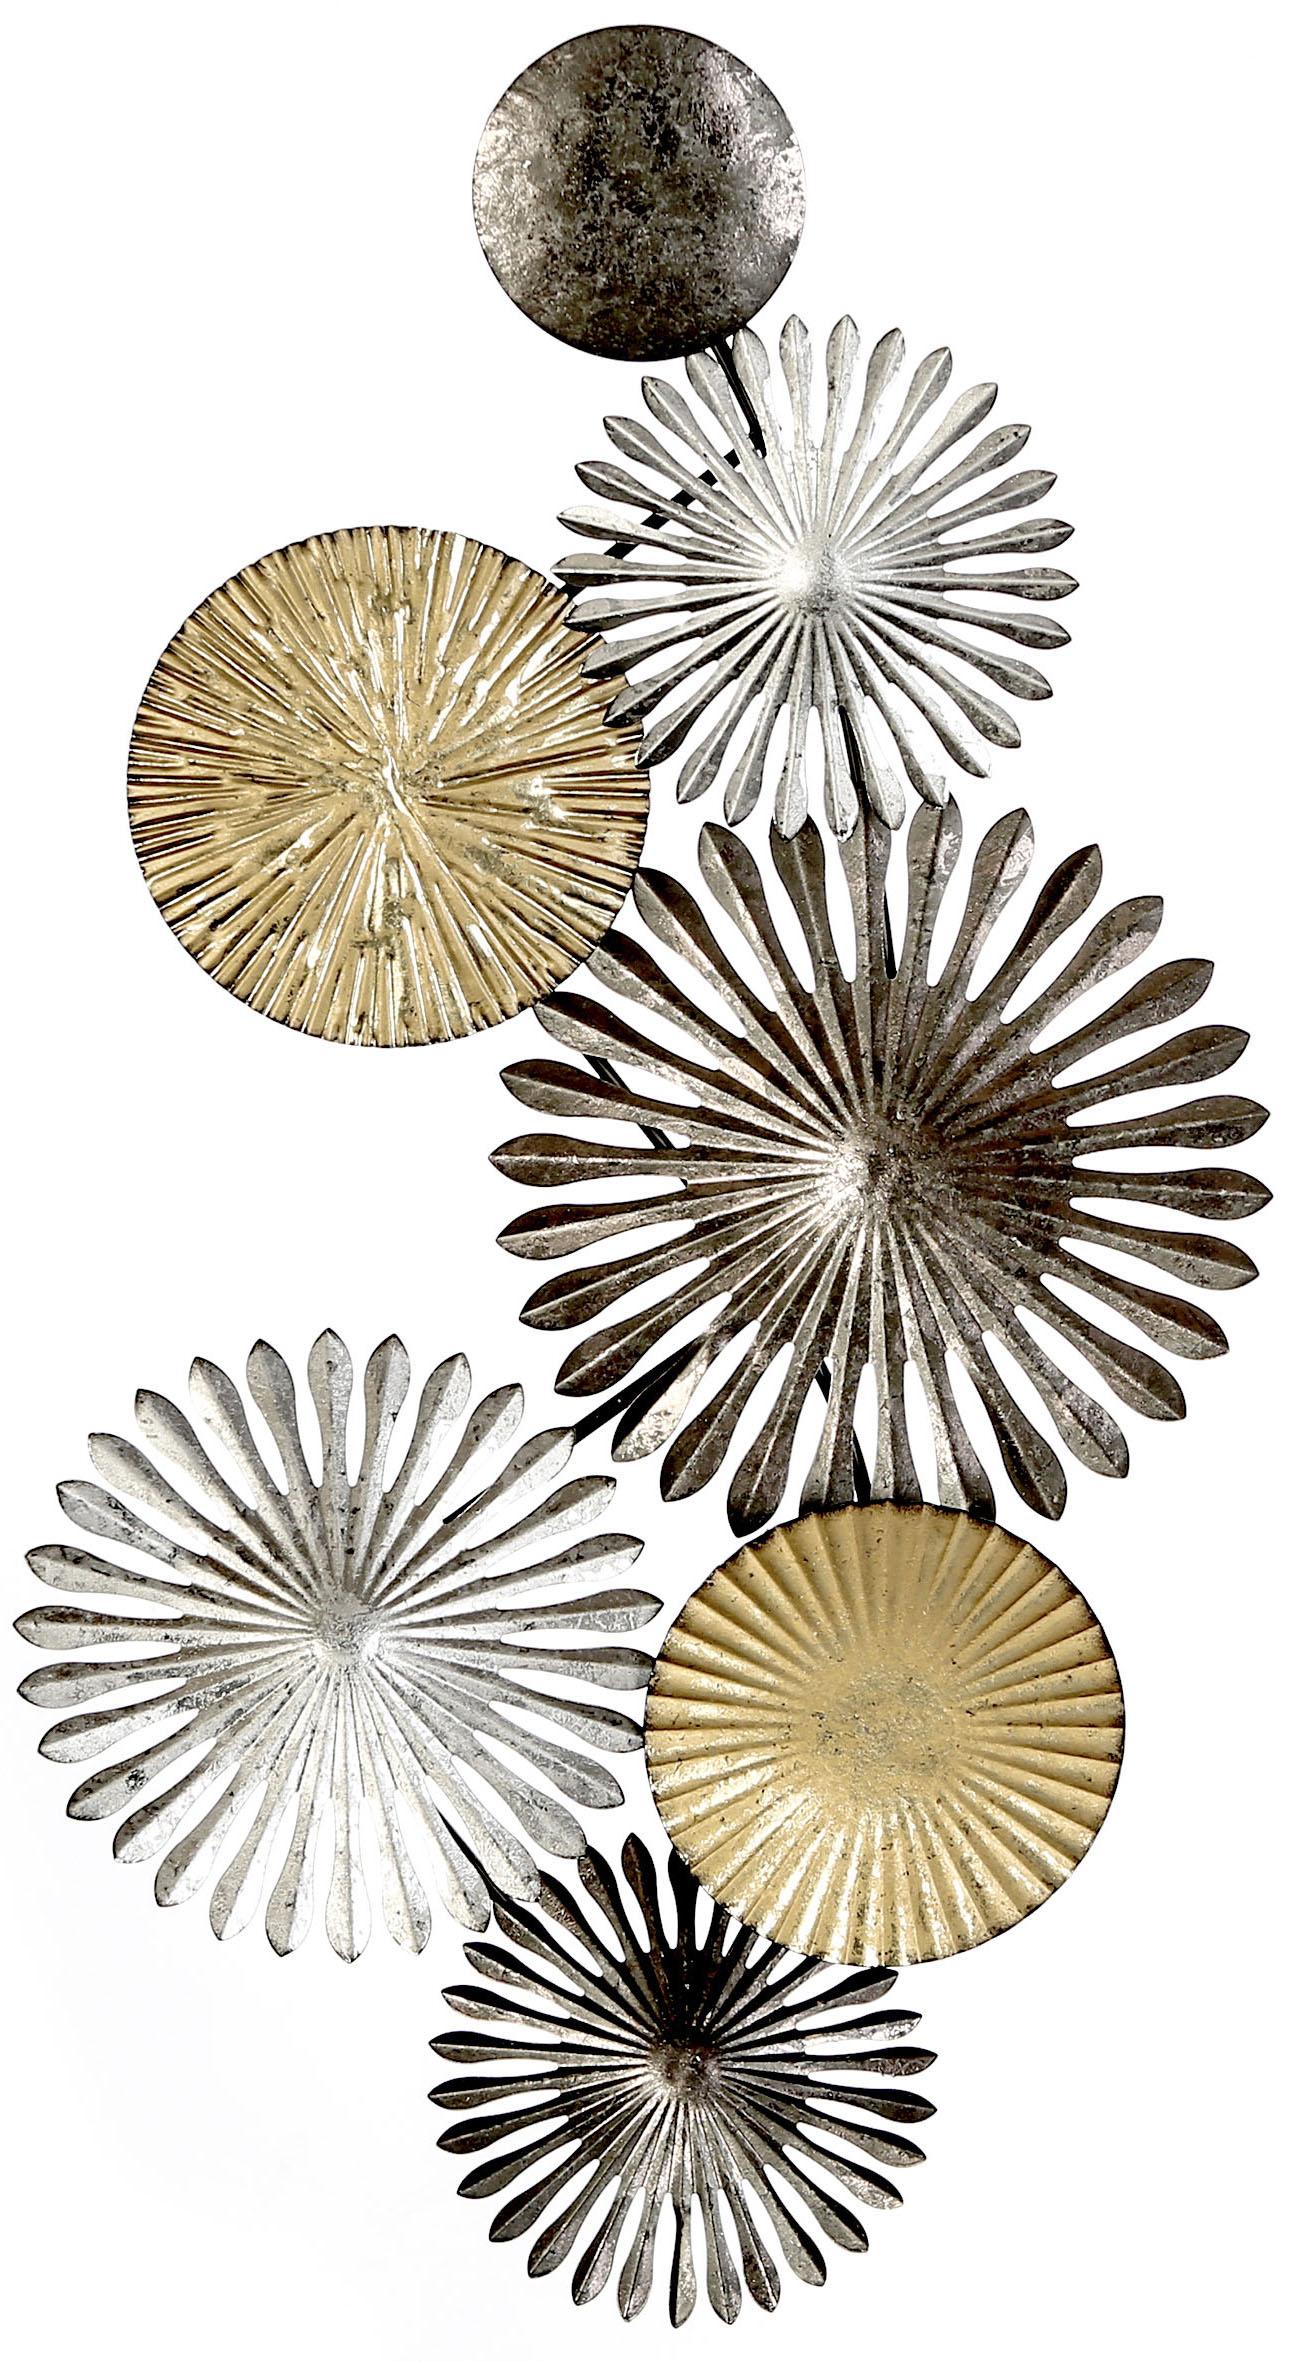 dekoratives modernes Wanddeko Objekt dreidimensional Metall schwarz-grau-taupe